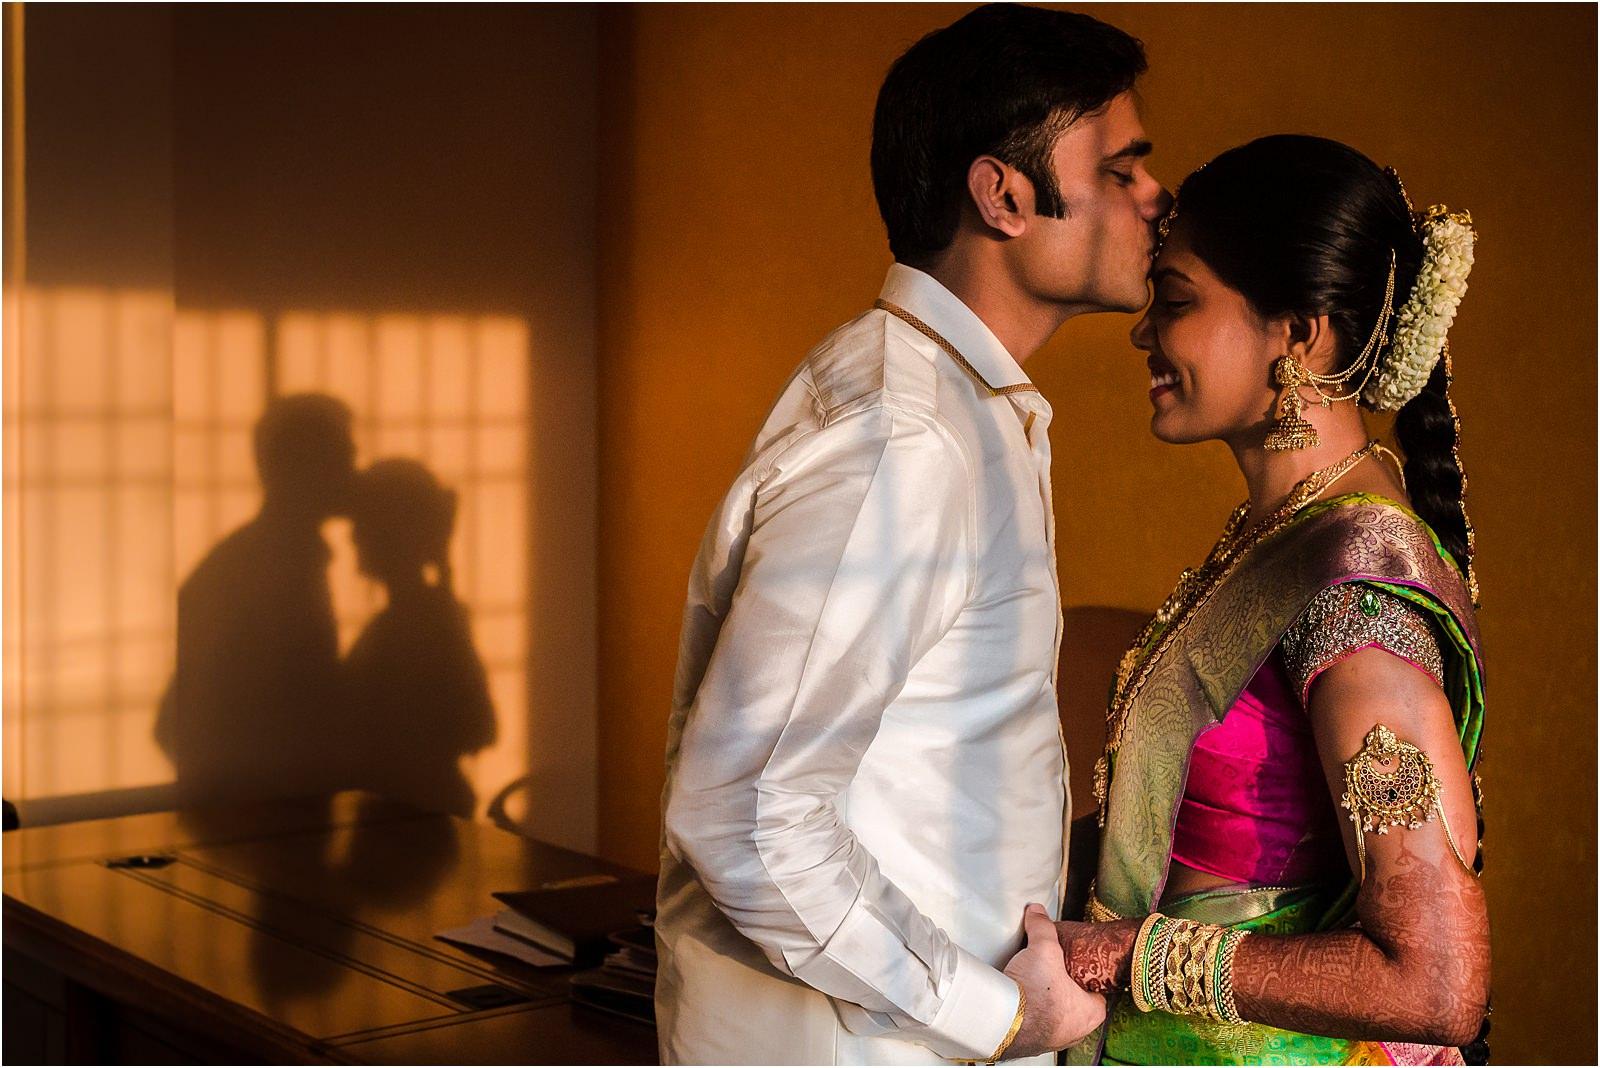 03022015-Divya-Santhosh-wedding-102-Edit.jpg